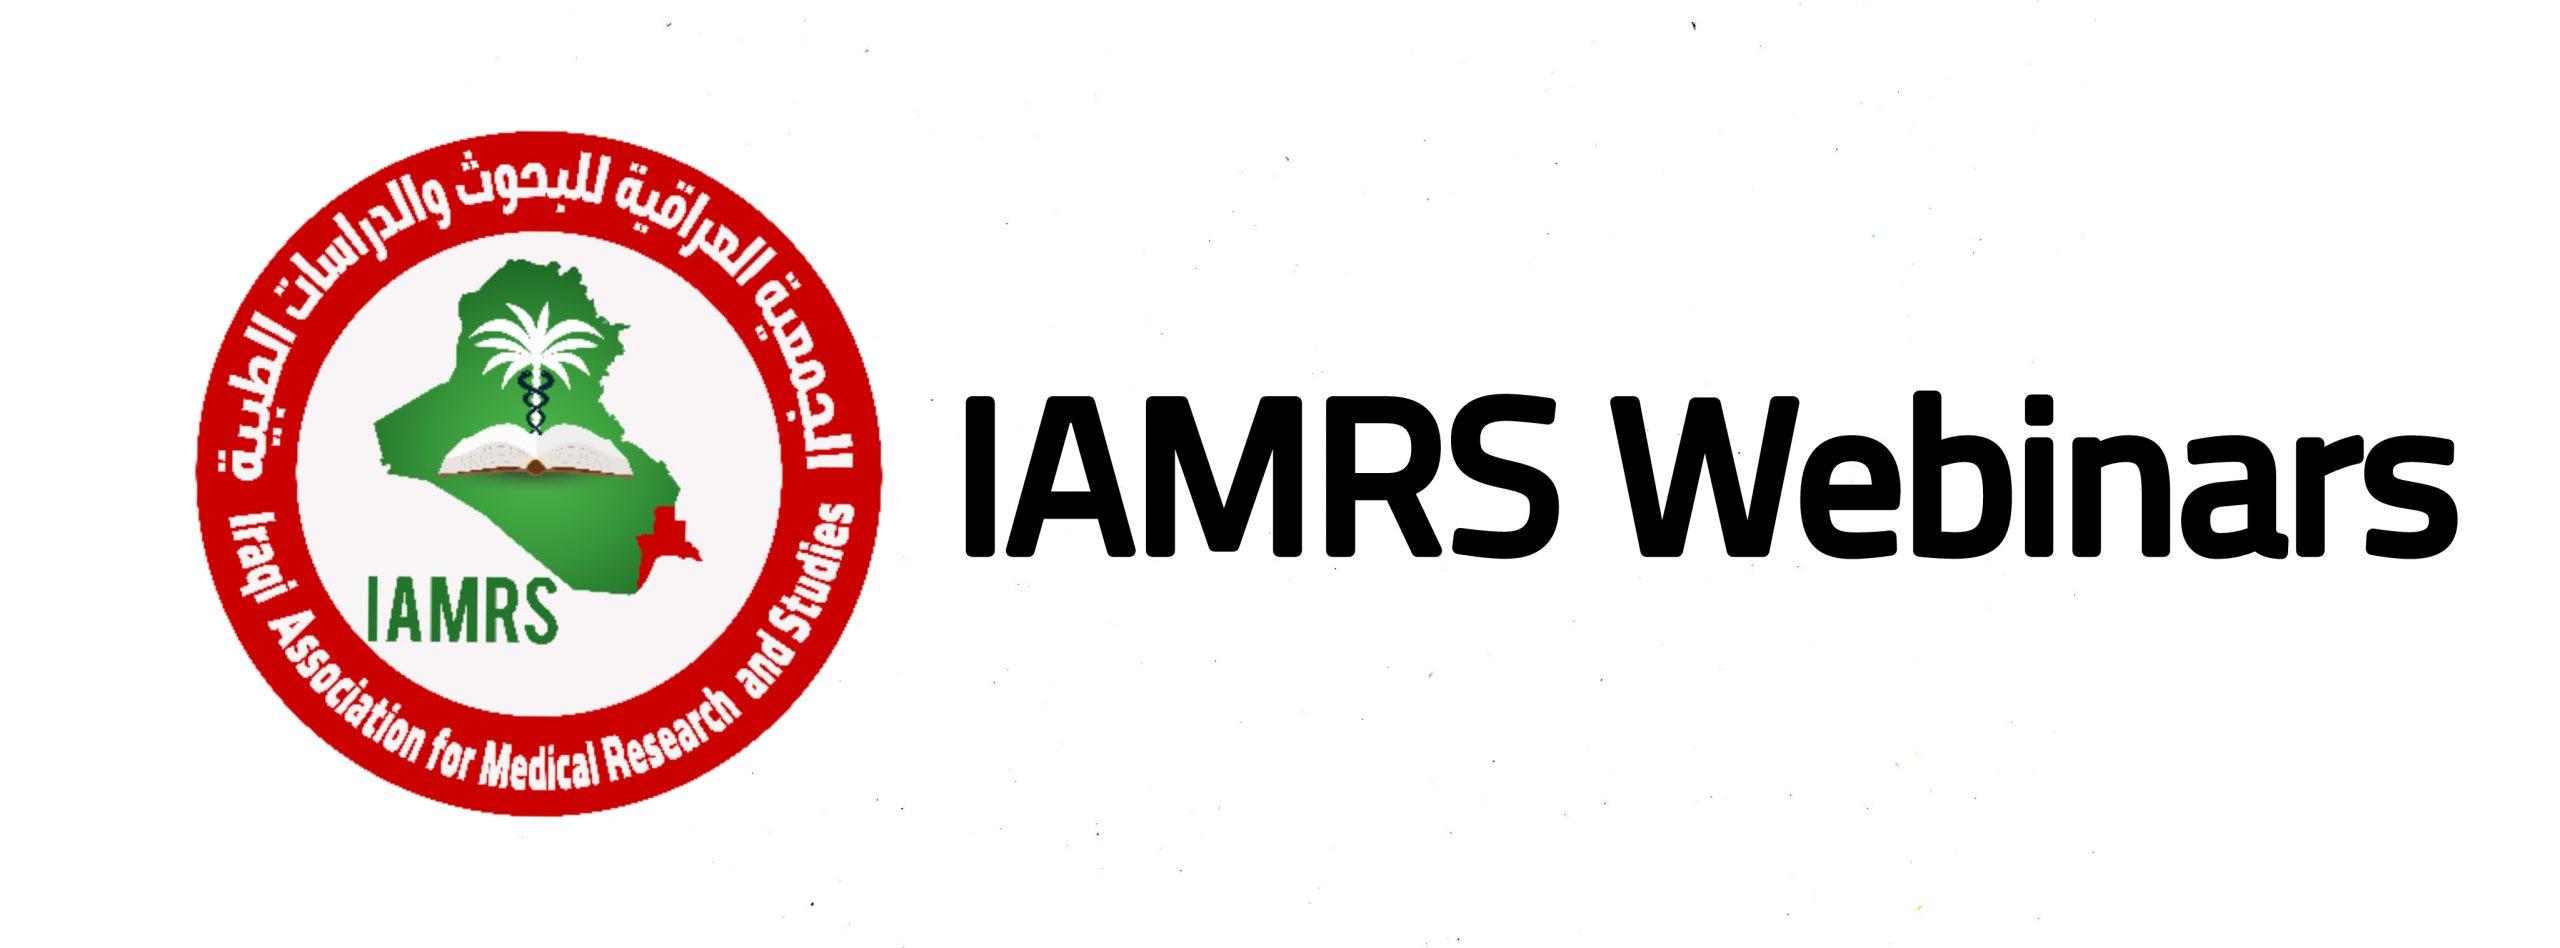 IAMRS Webinars